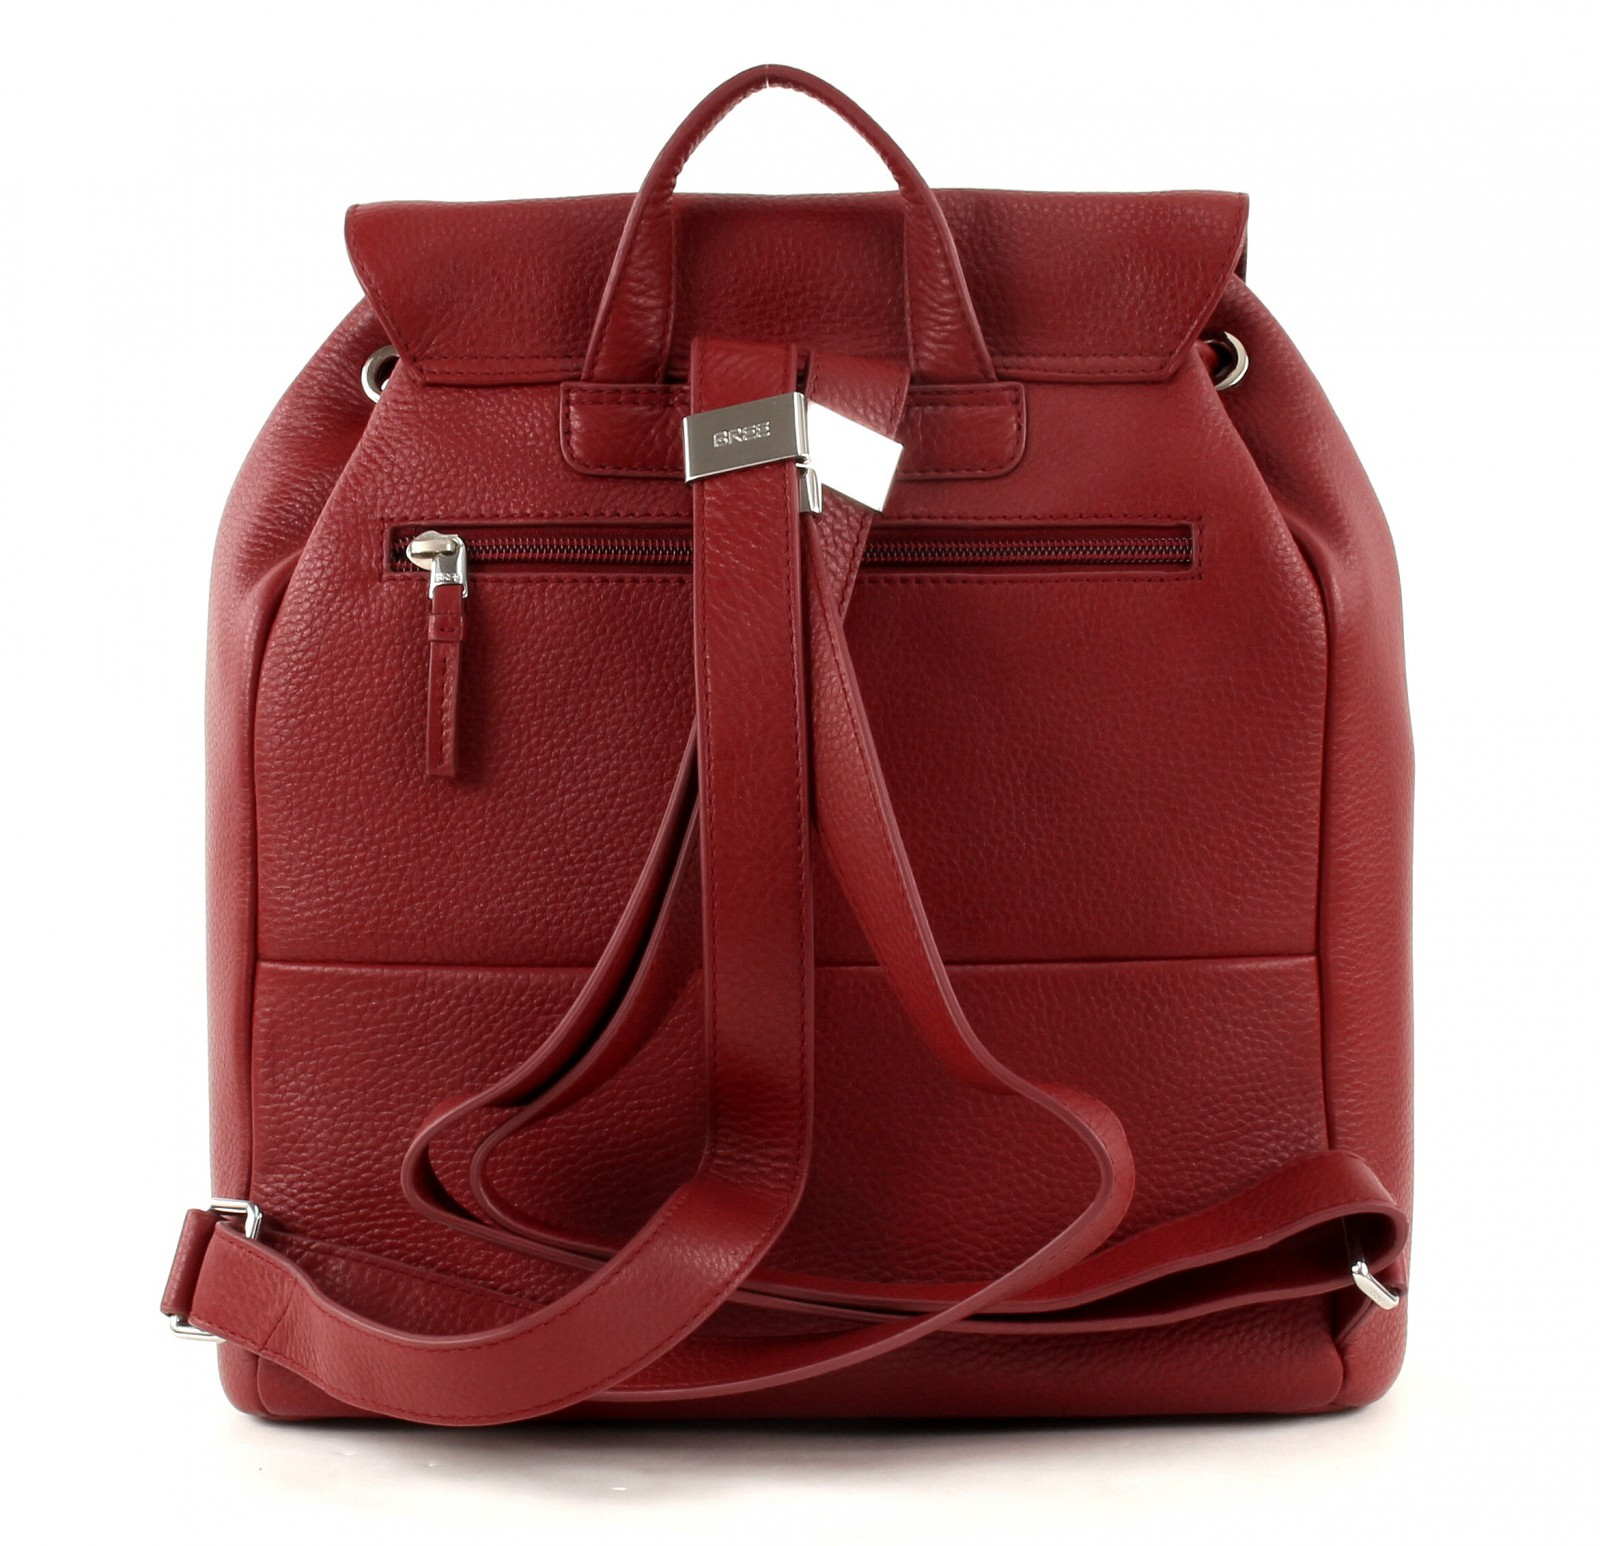 Bree Backpack Faro 4 Brick Red